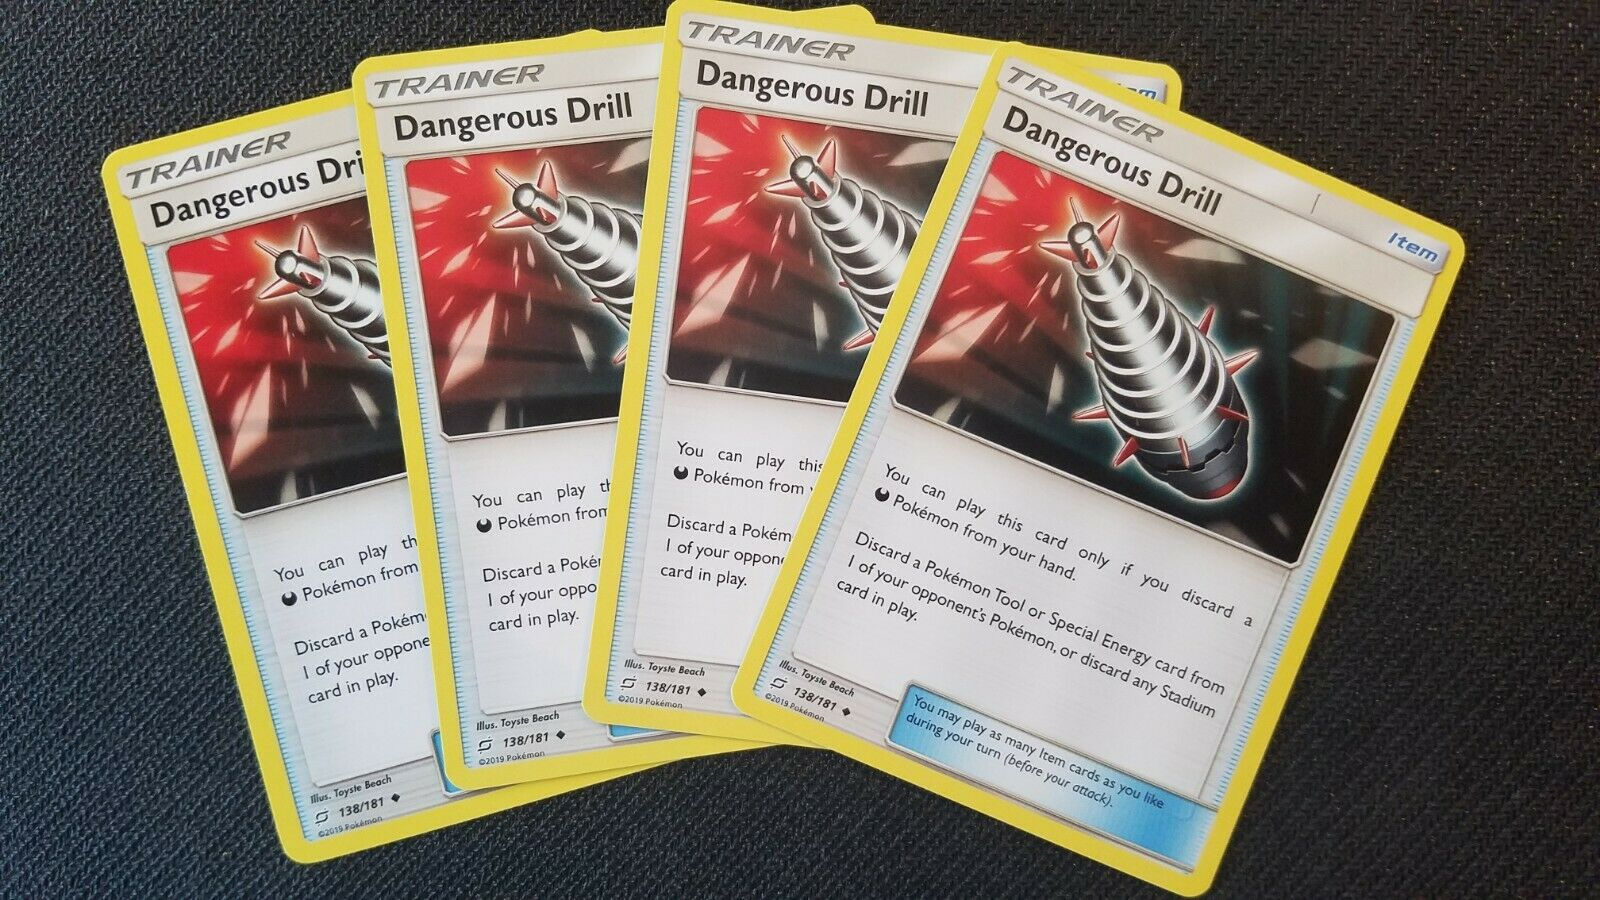 138//181 x4 4x cards Pokemon Sun /& Moon TEAM UP Dangerous Drill